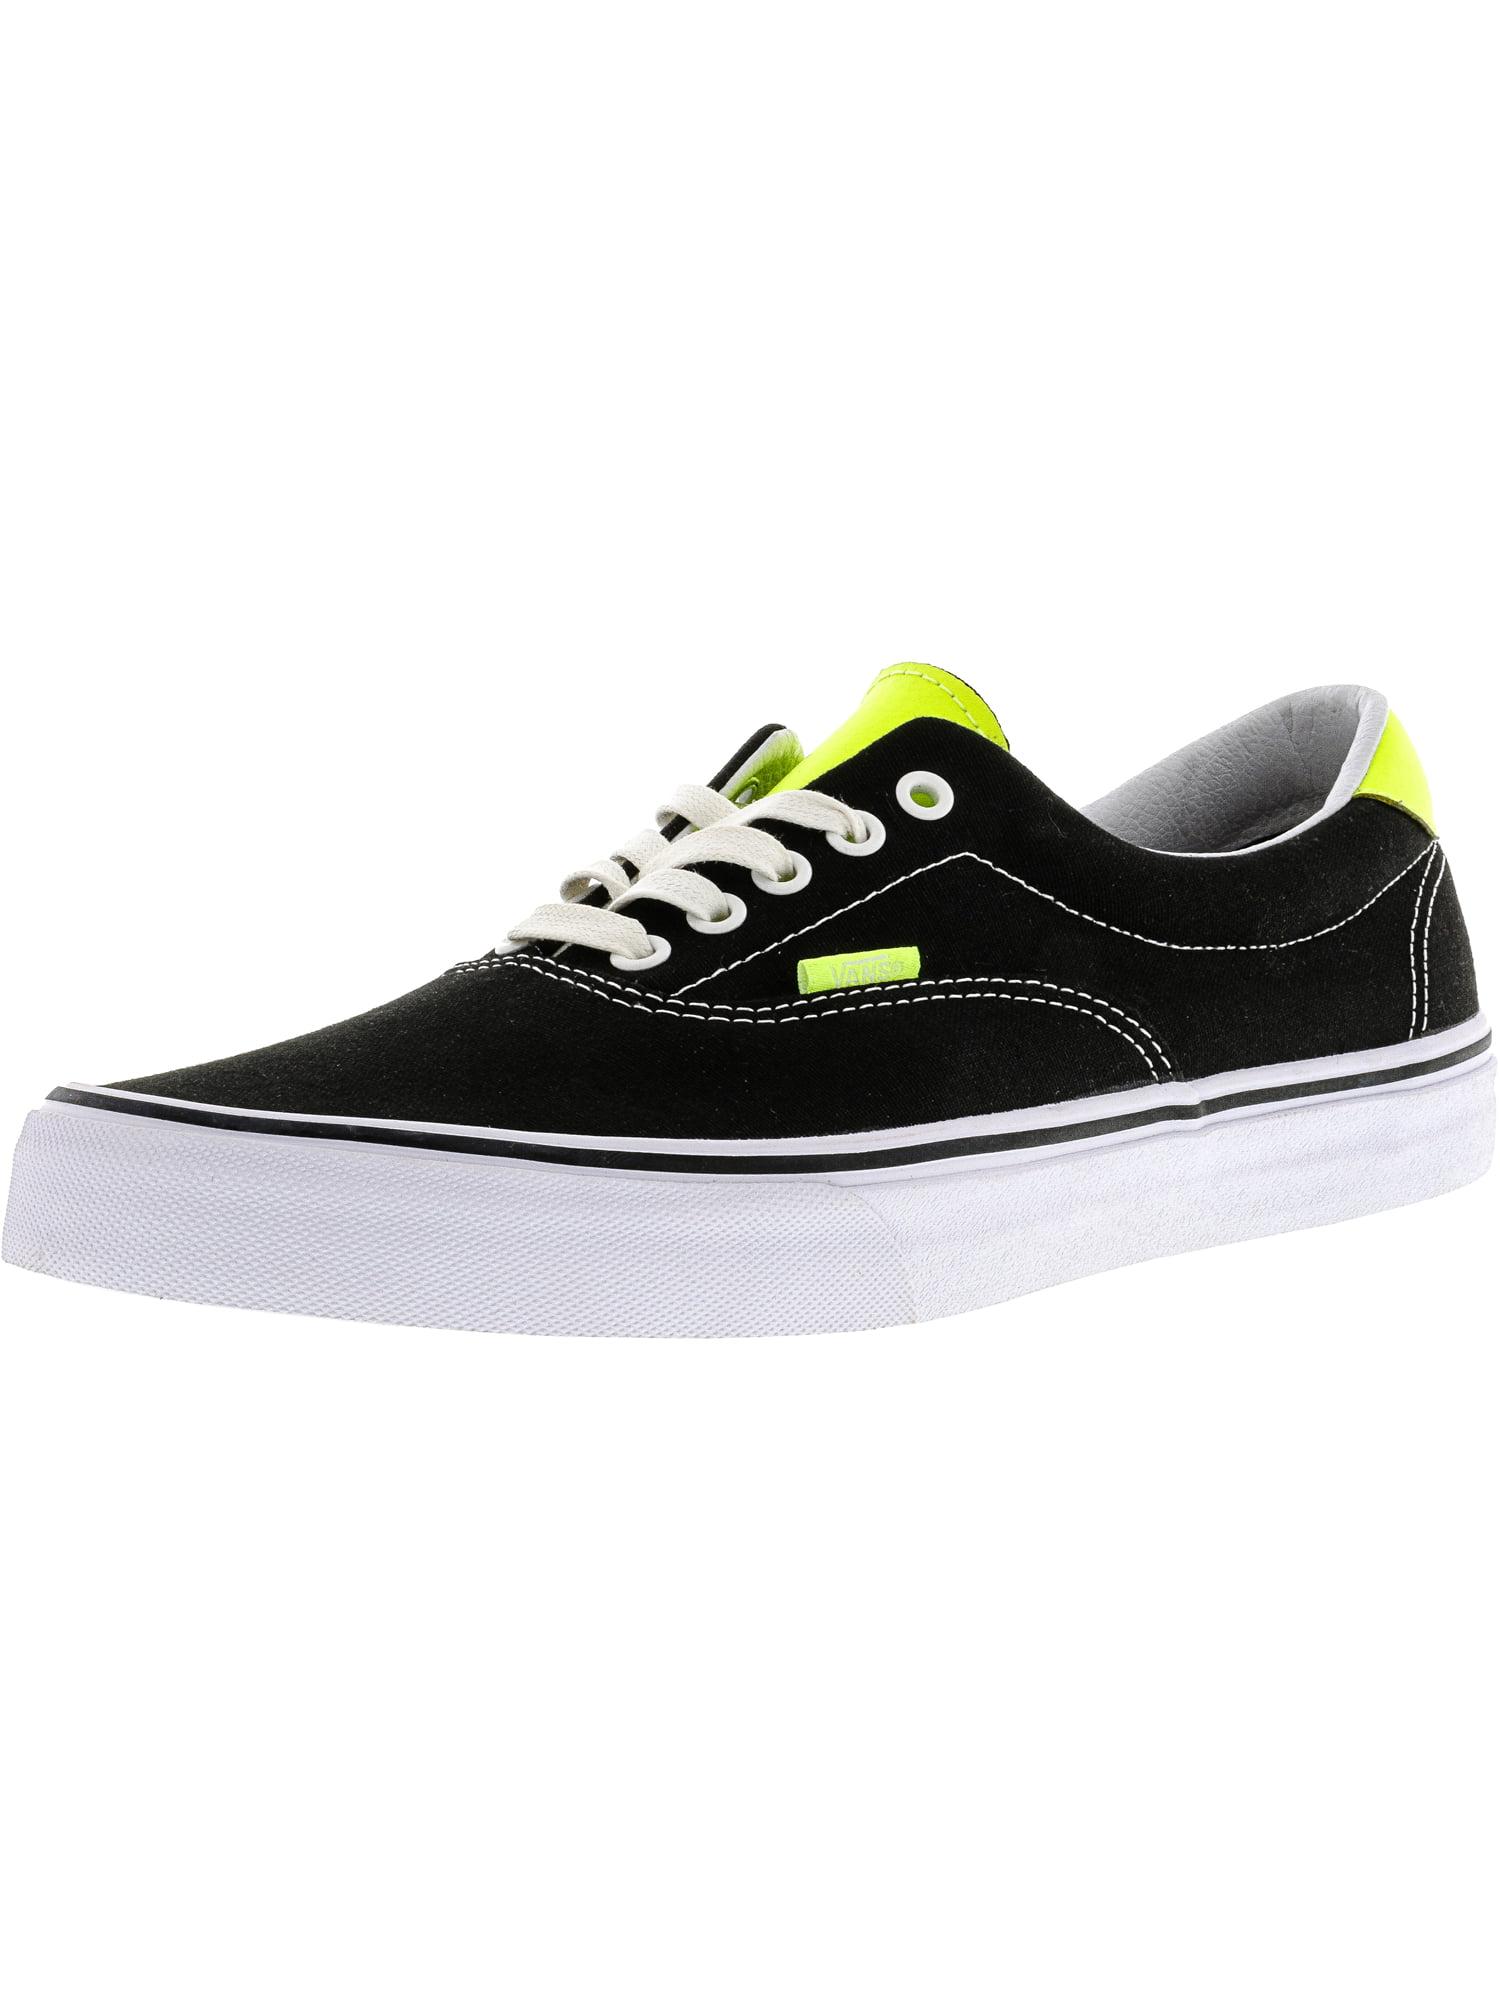 Vans Men's Era 59 Neon Leather Black / Yellow Ankle-High Canvas Skateboarding Shoe - 11.5M